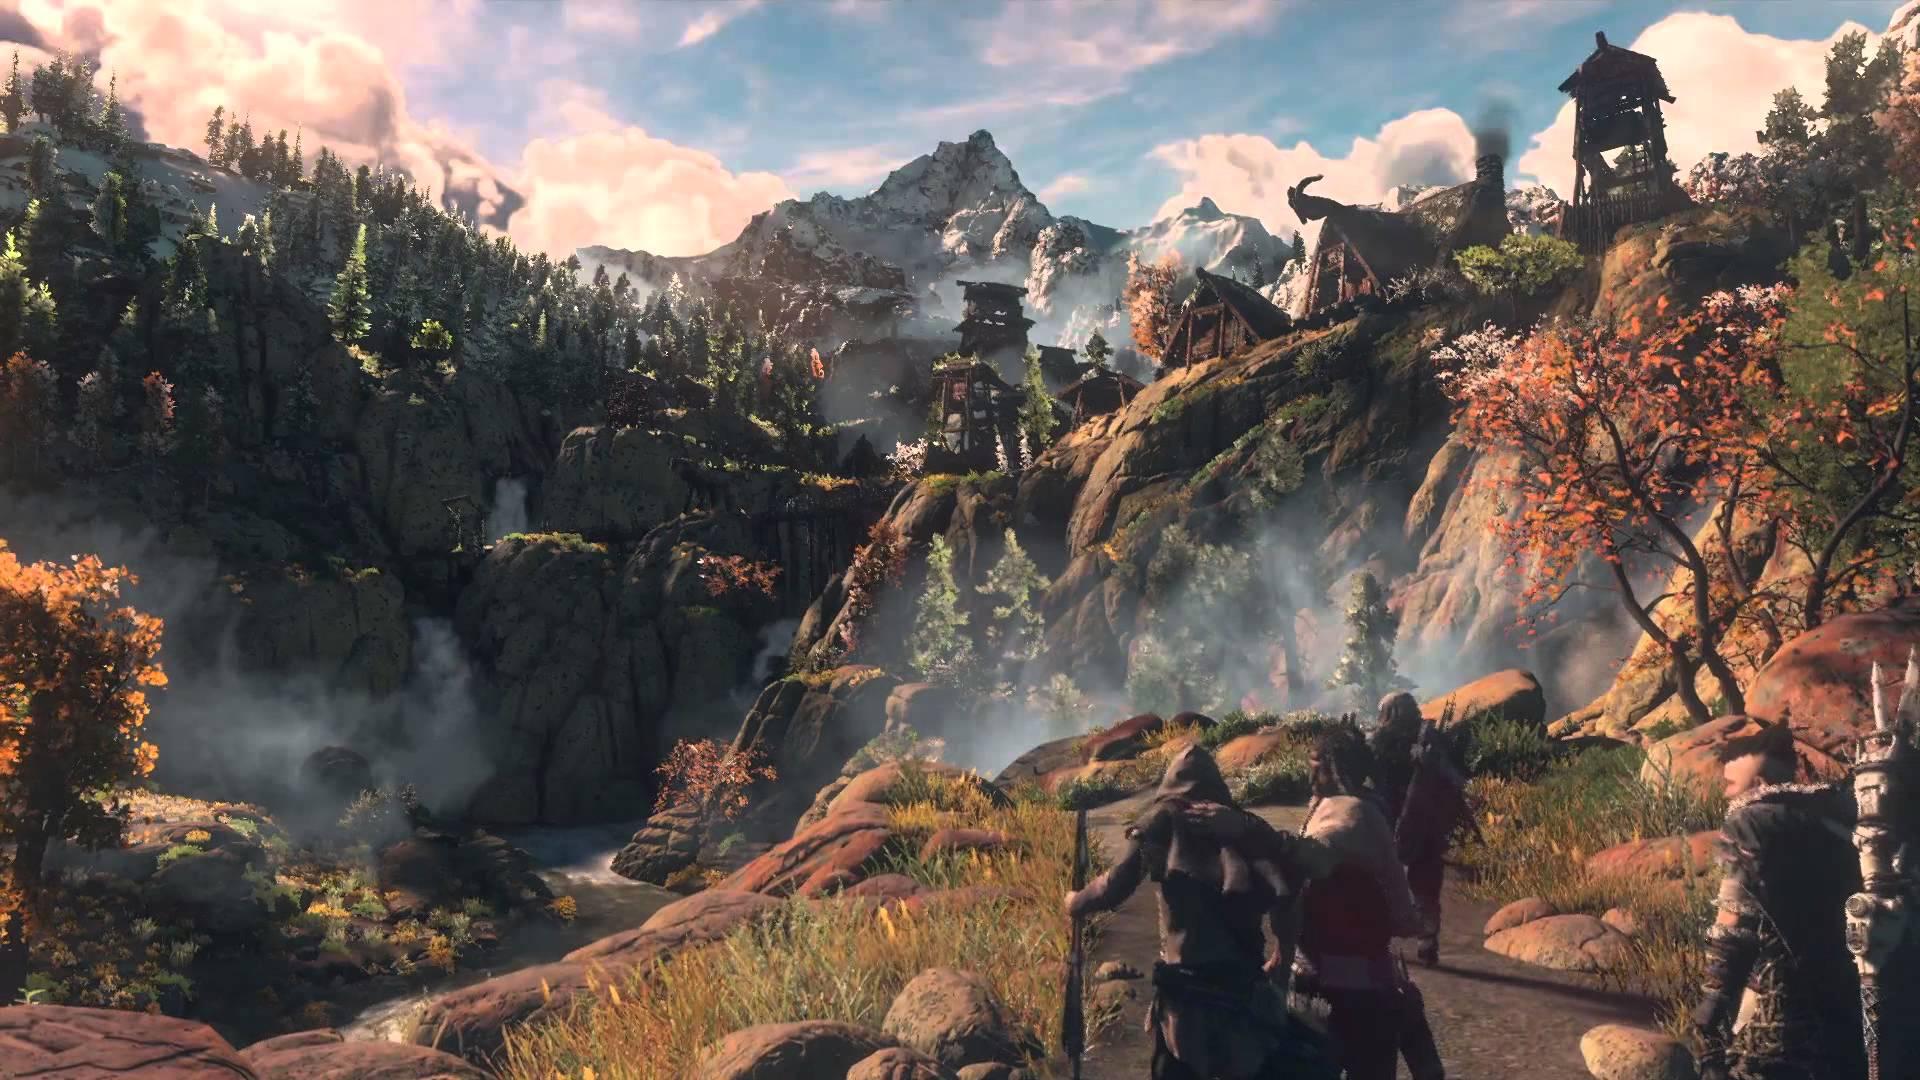 Best Horizon Zero Dawn Game Wallpapers - Horizon Zero Dawn Village , HD Wallpaper & Backgrounds